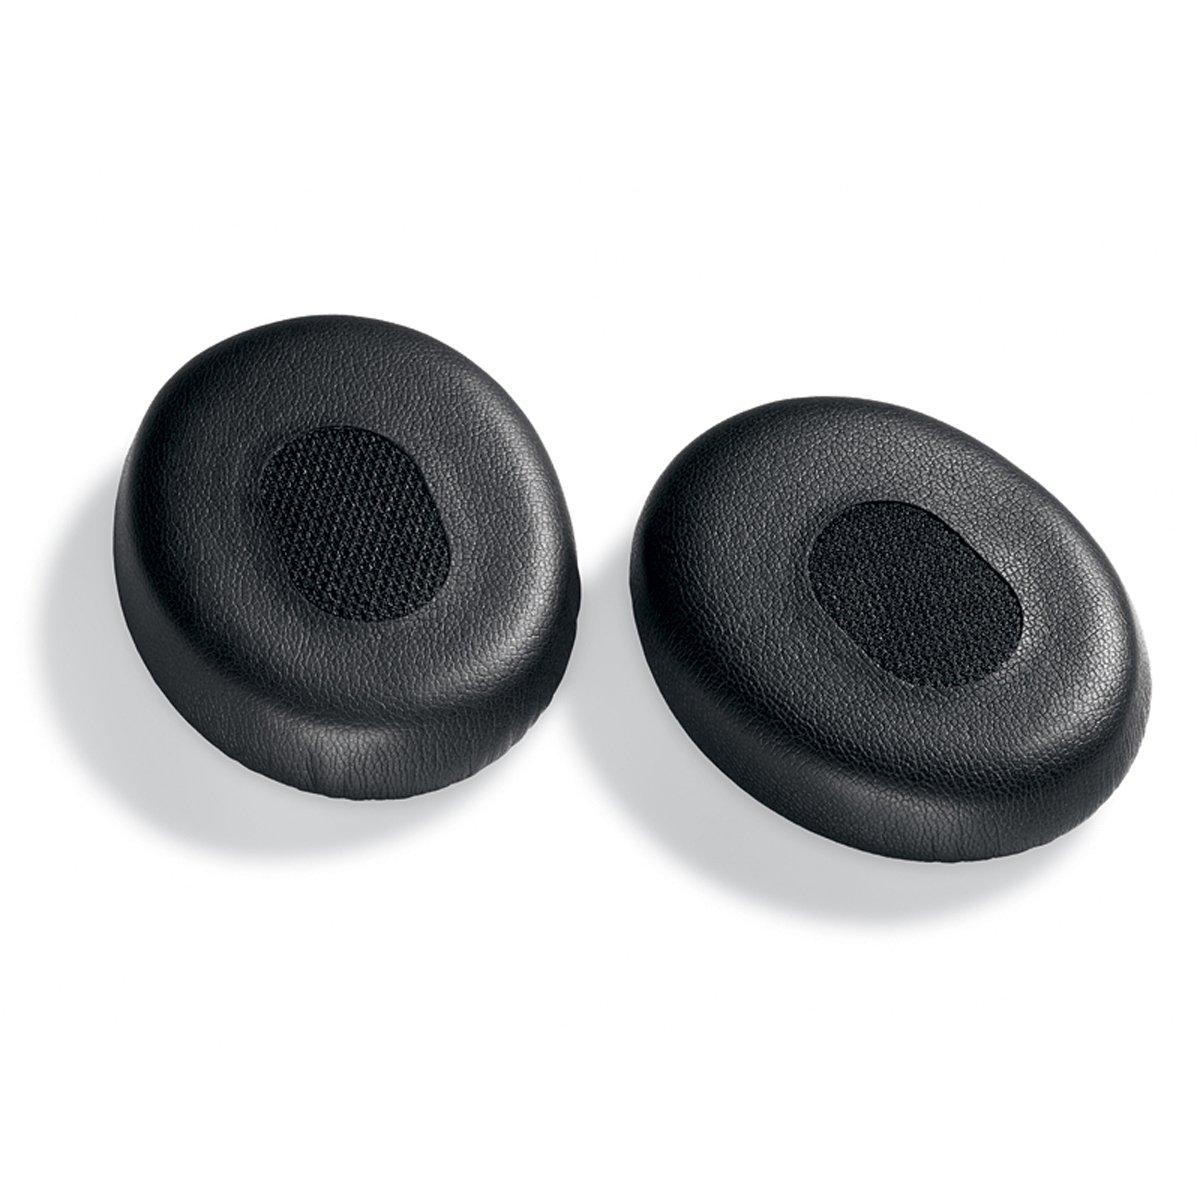 QuietComfort 3 ear cushion kit